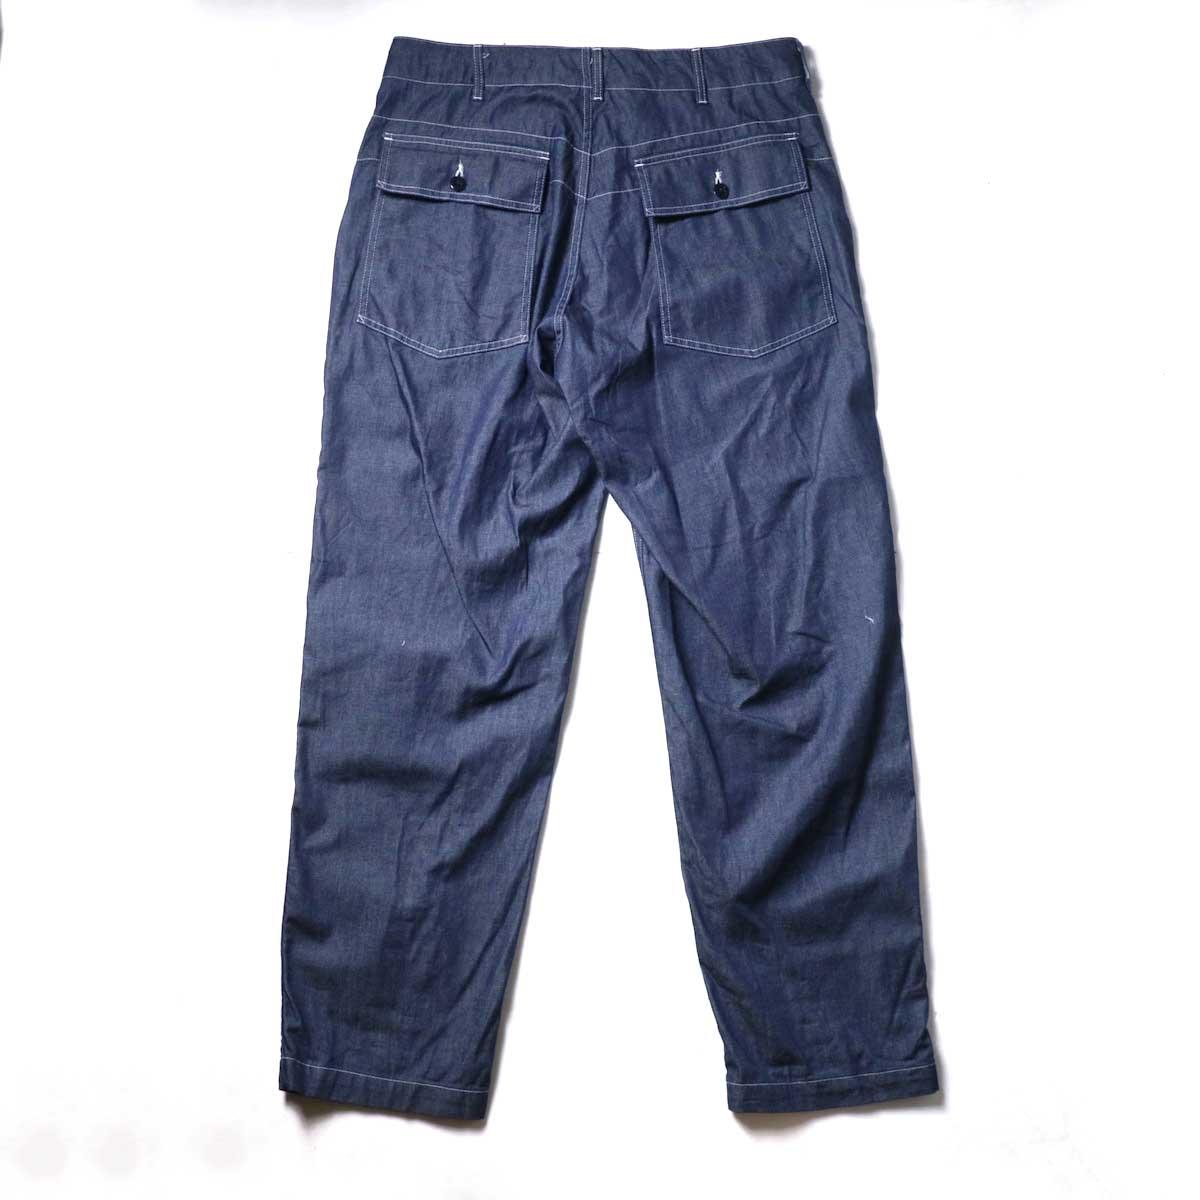 Engineered Garments / Fatigue Pant - 8oz Cone Denim (Indigo)背面